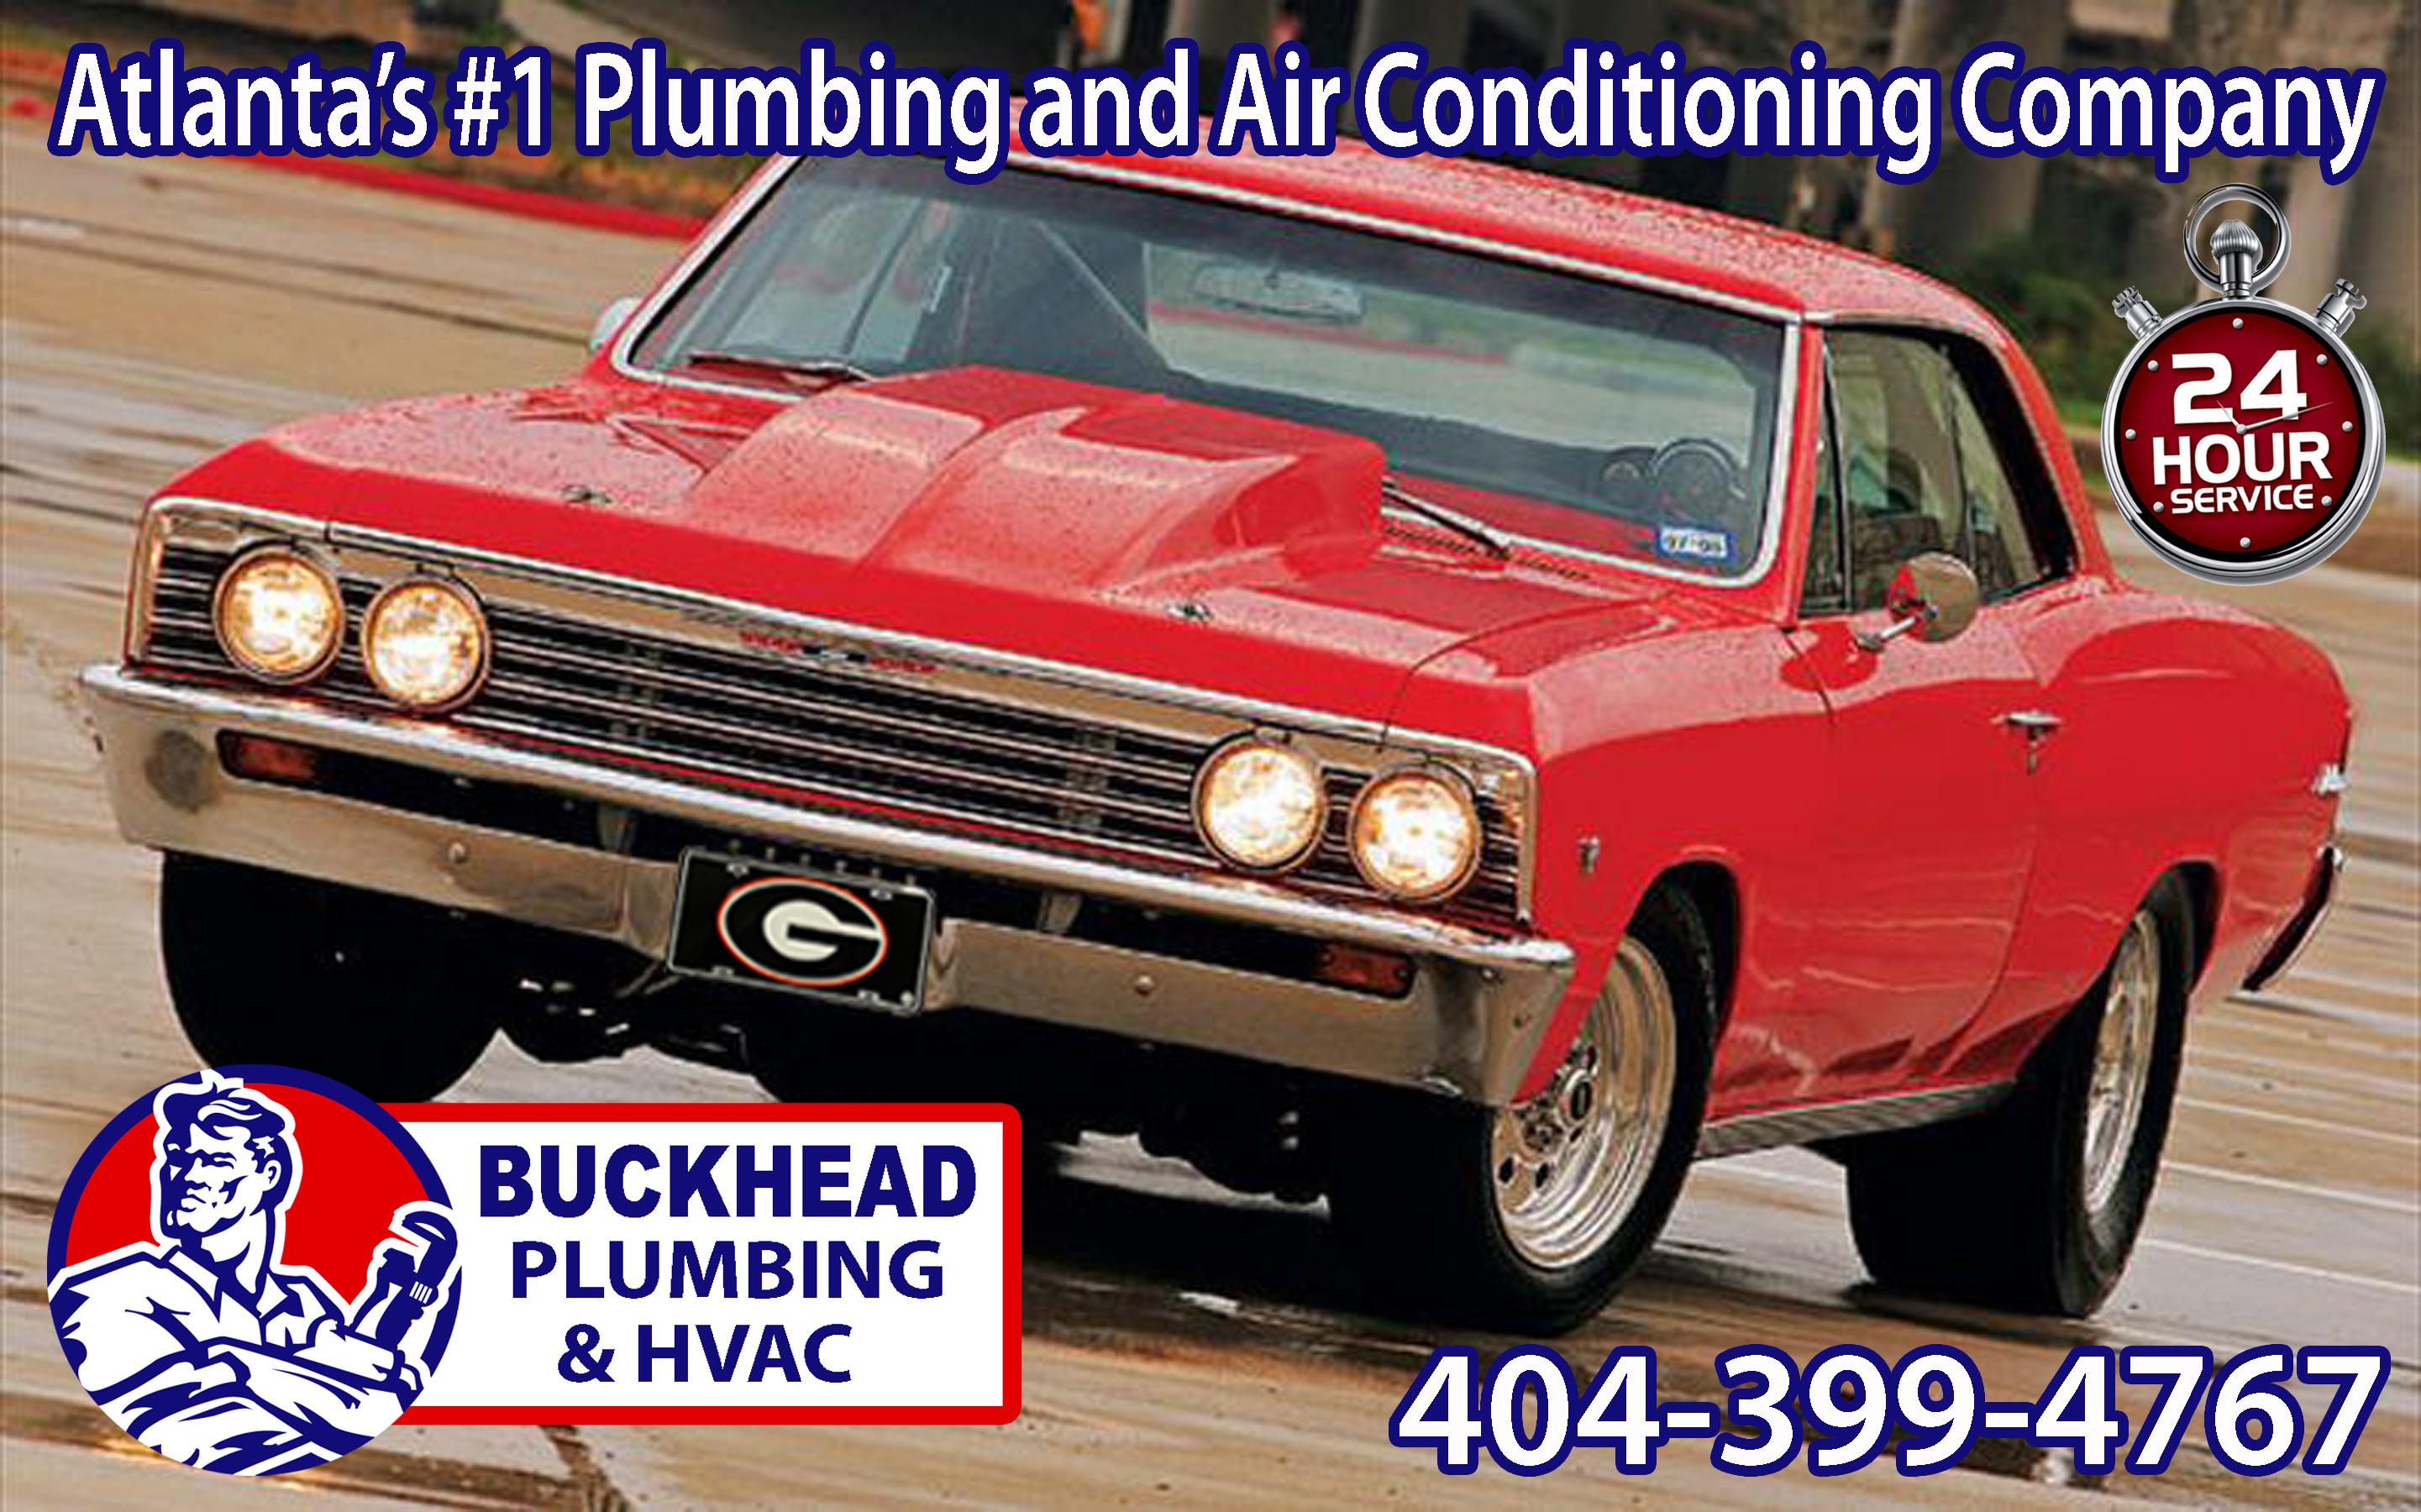 Buckhead Plumbing & HVAC in Atlanta, GA, photo #2